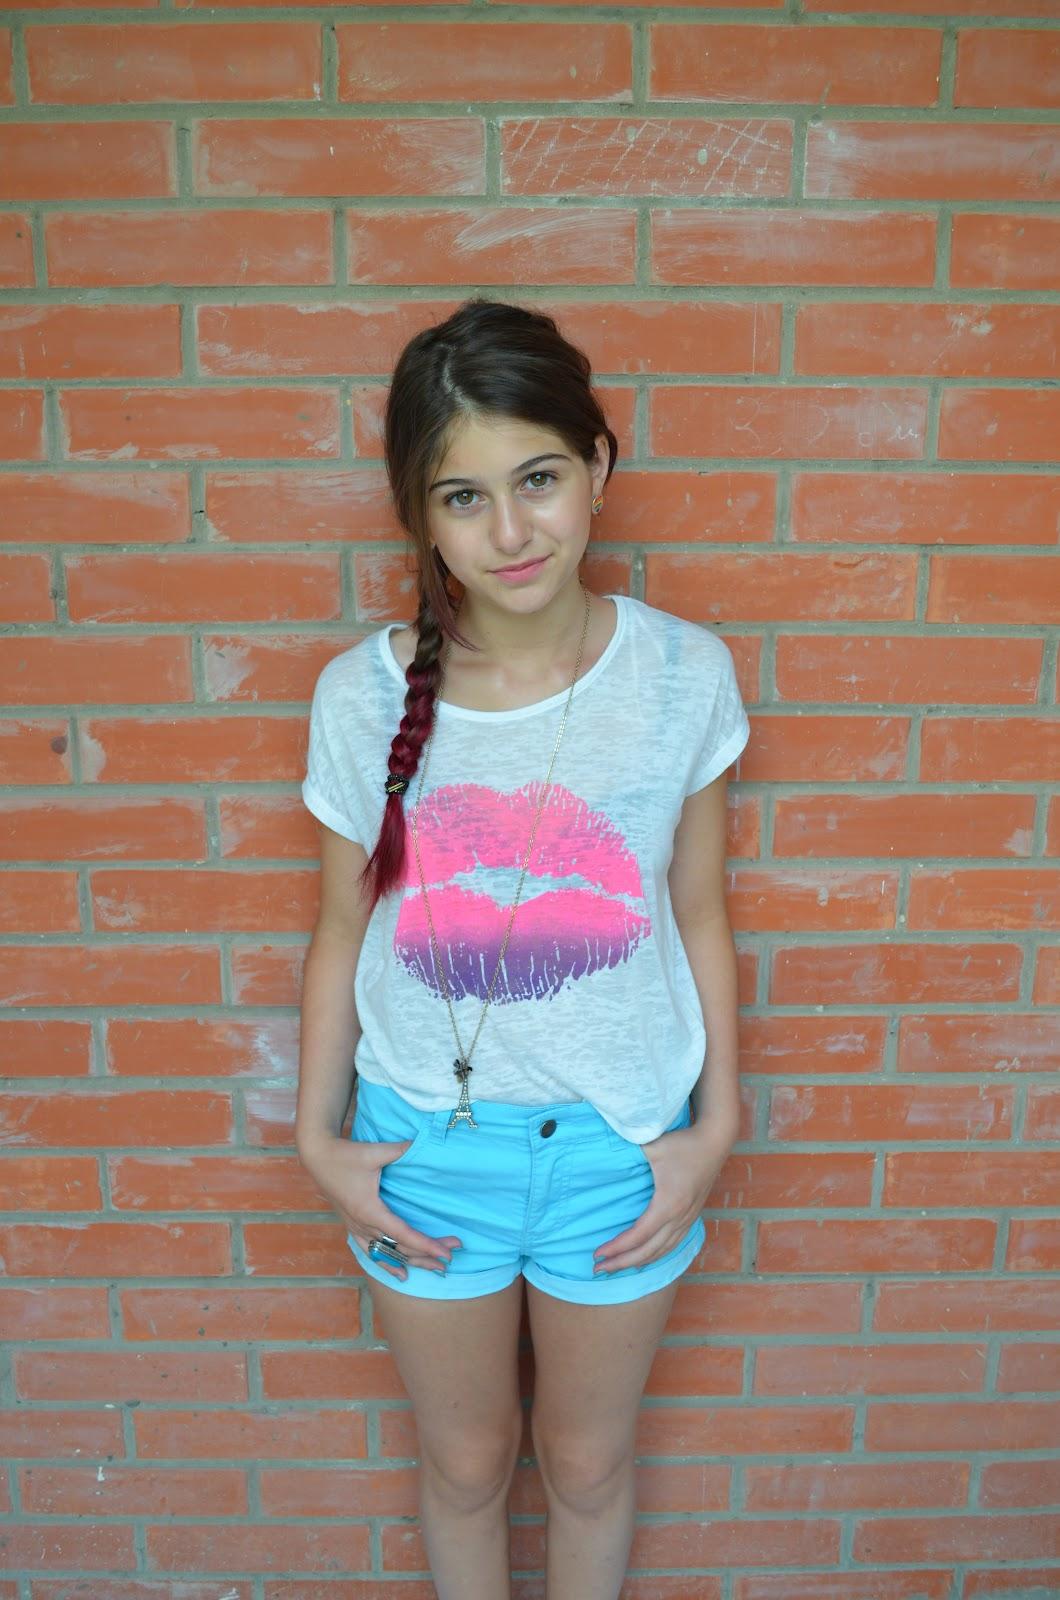 юных девочек фото скачать бесплатно: http://marafon-luzhniki.ru/page/unih_devochek_foto_skachat_besplatno/